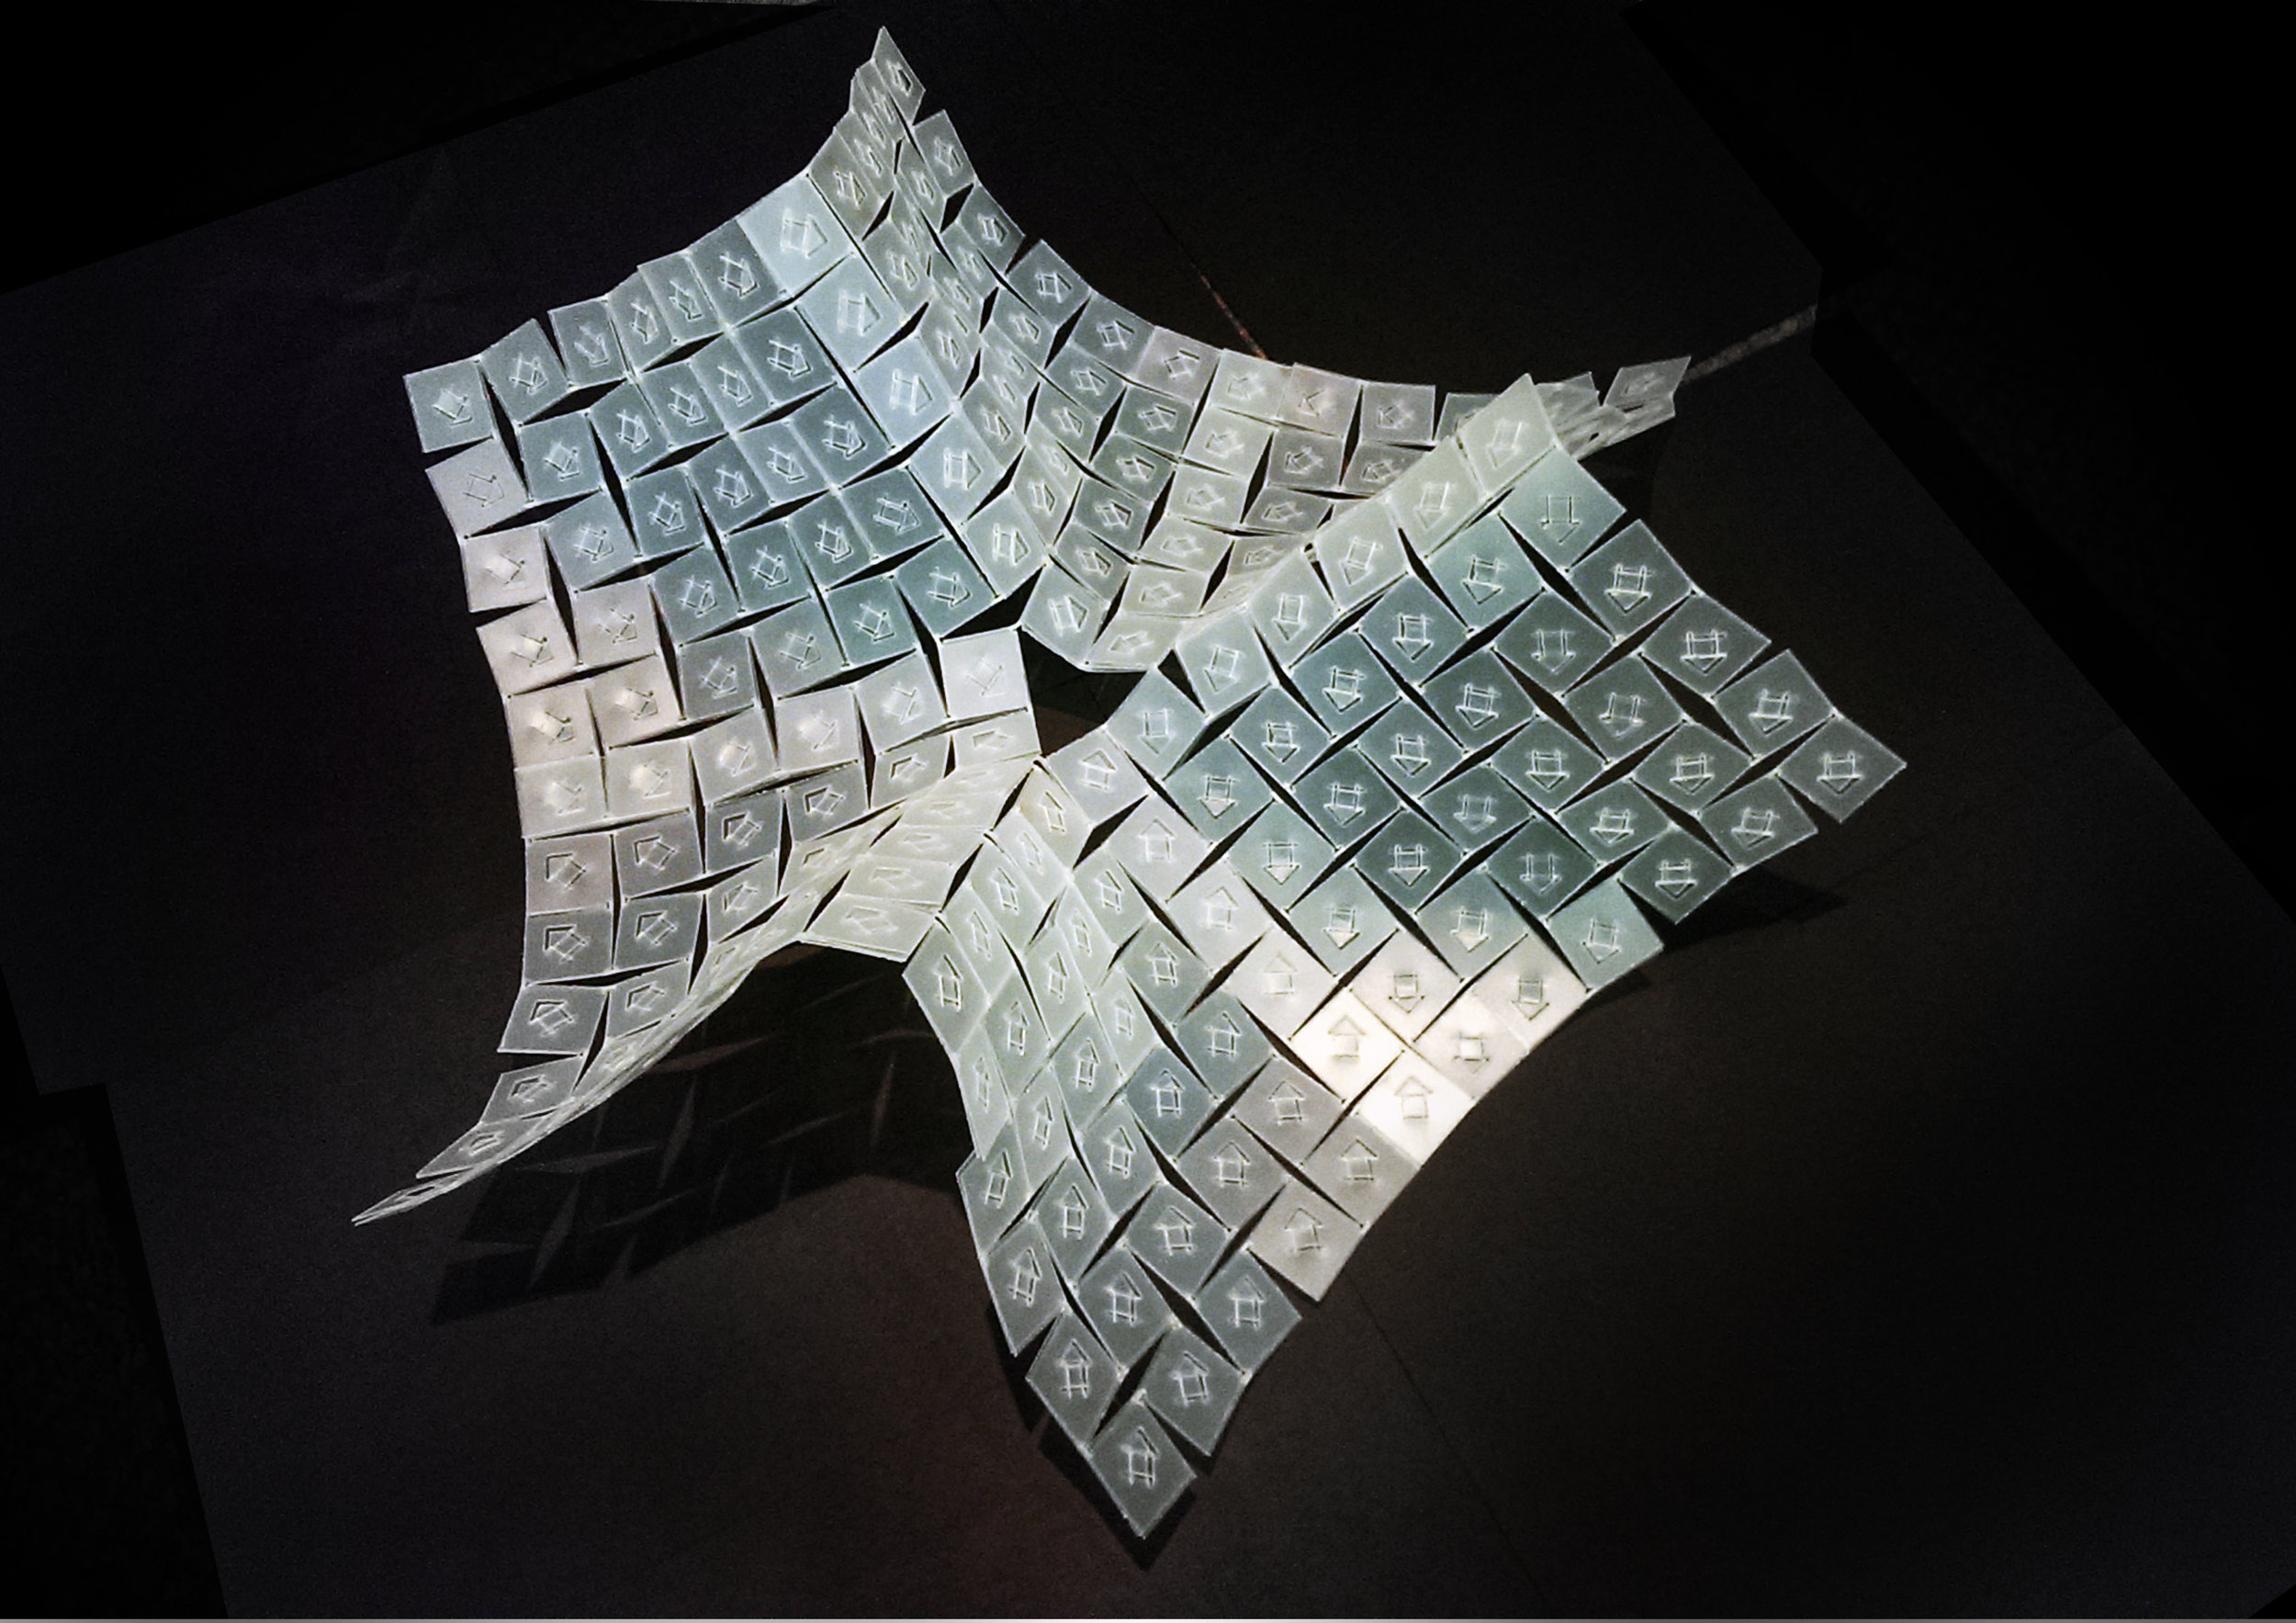 Kintetic Tiling 008.jpg